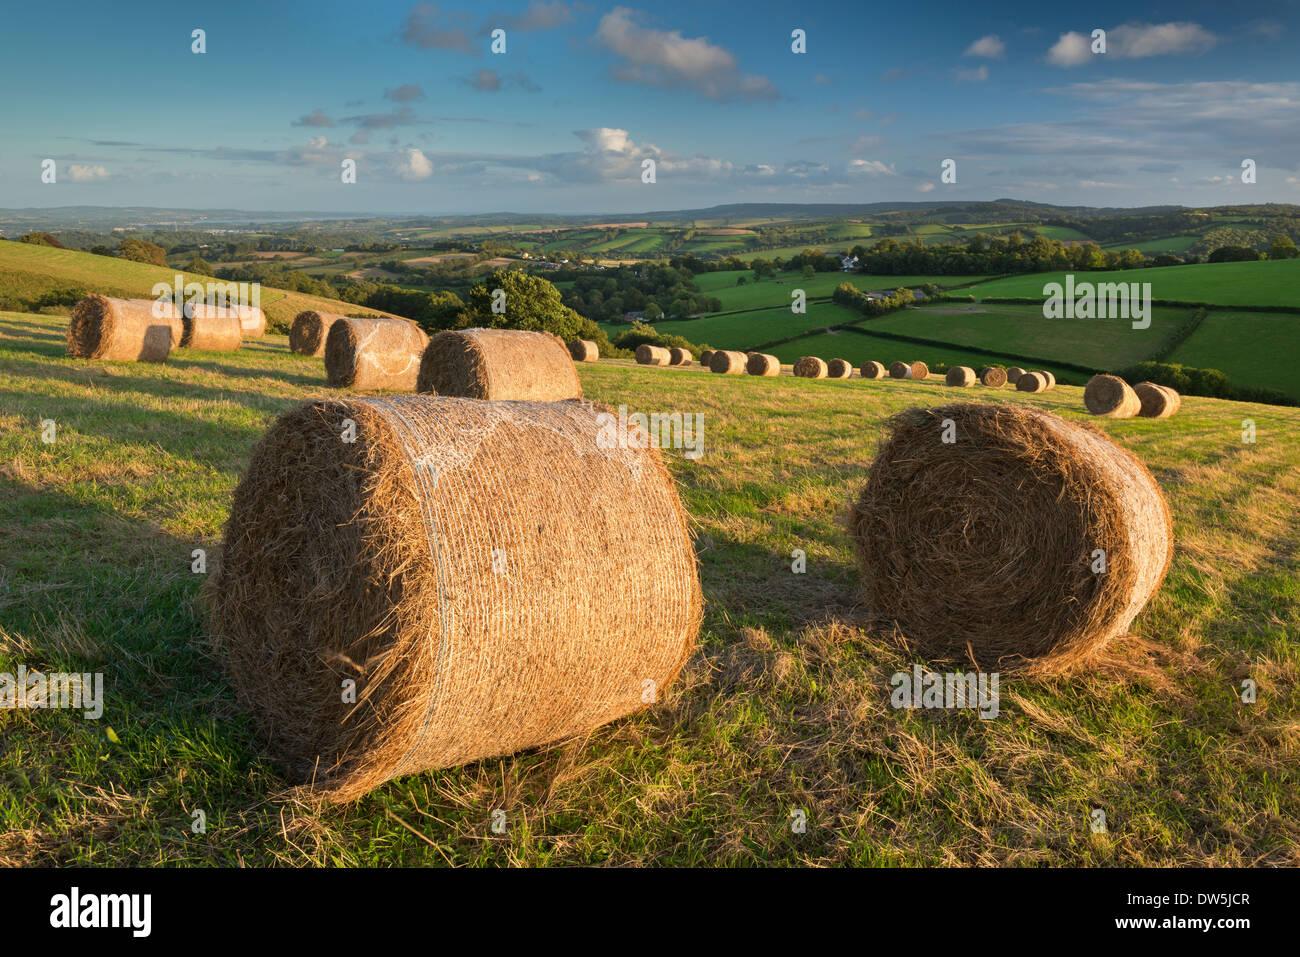 Heuballen in den hügeligen Bereichen Mid Devon, England. Herbst (September) 2012. Stockbild